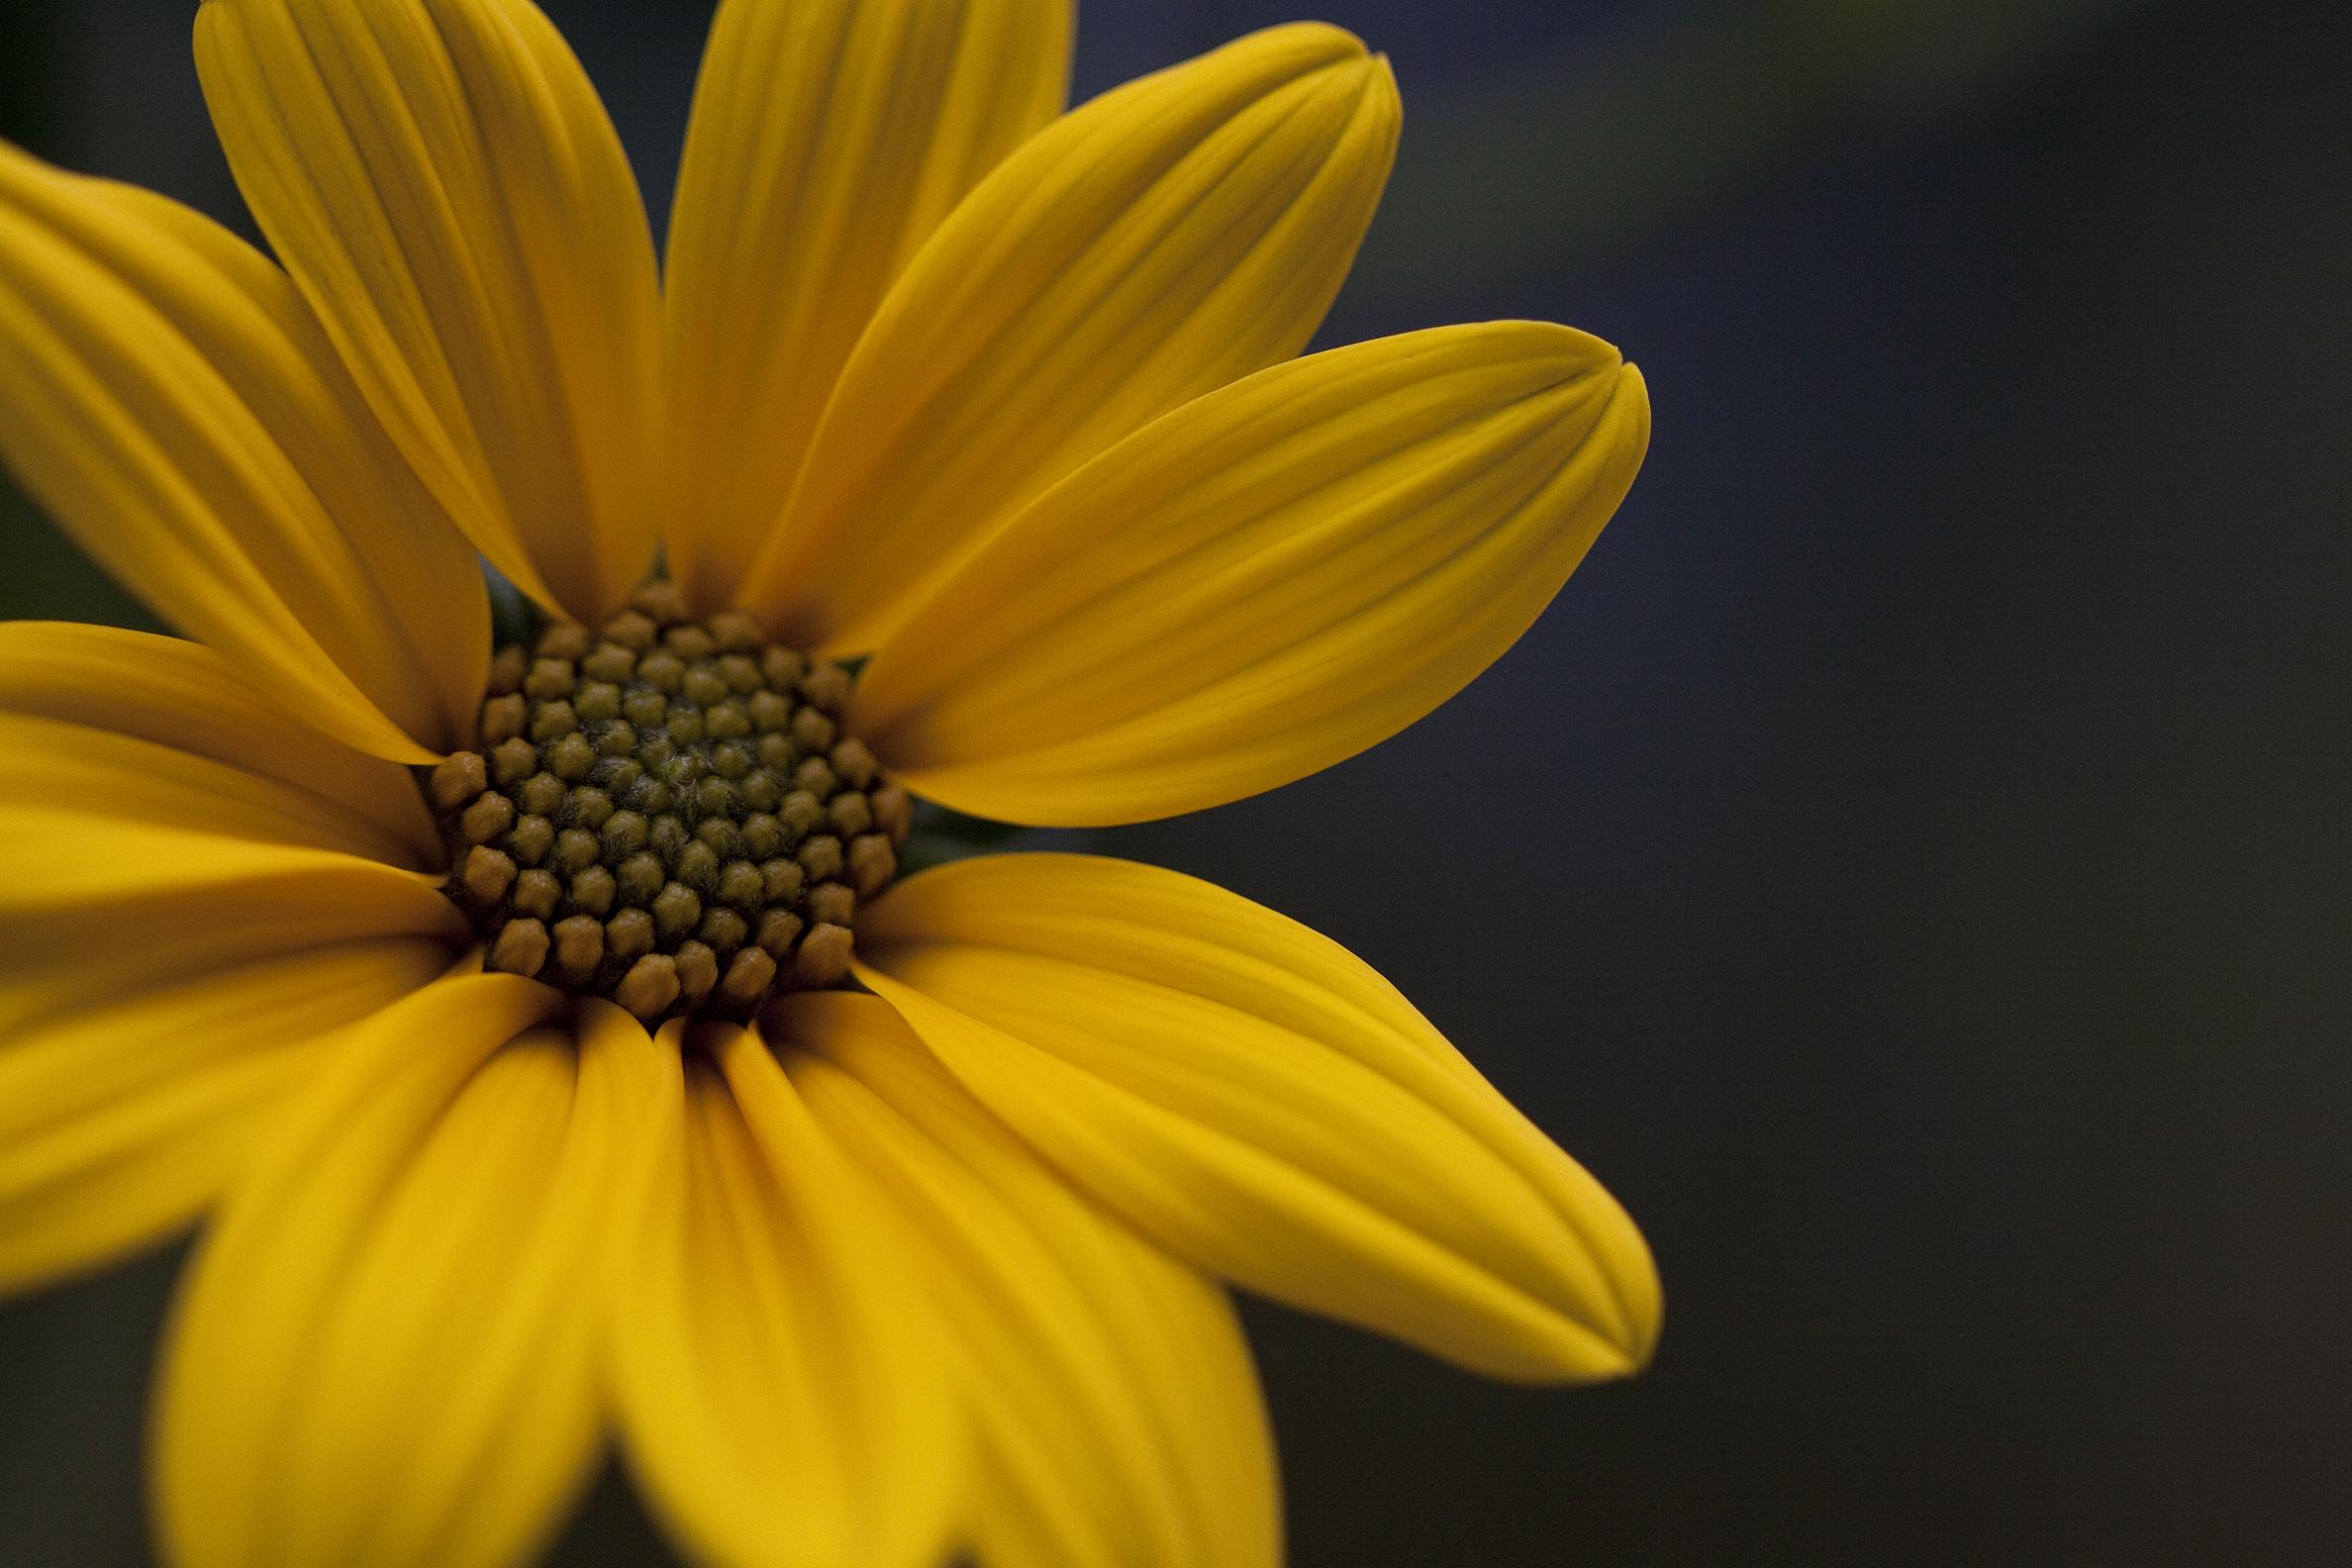 jerusalem artichoke closeup